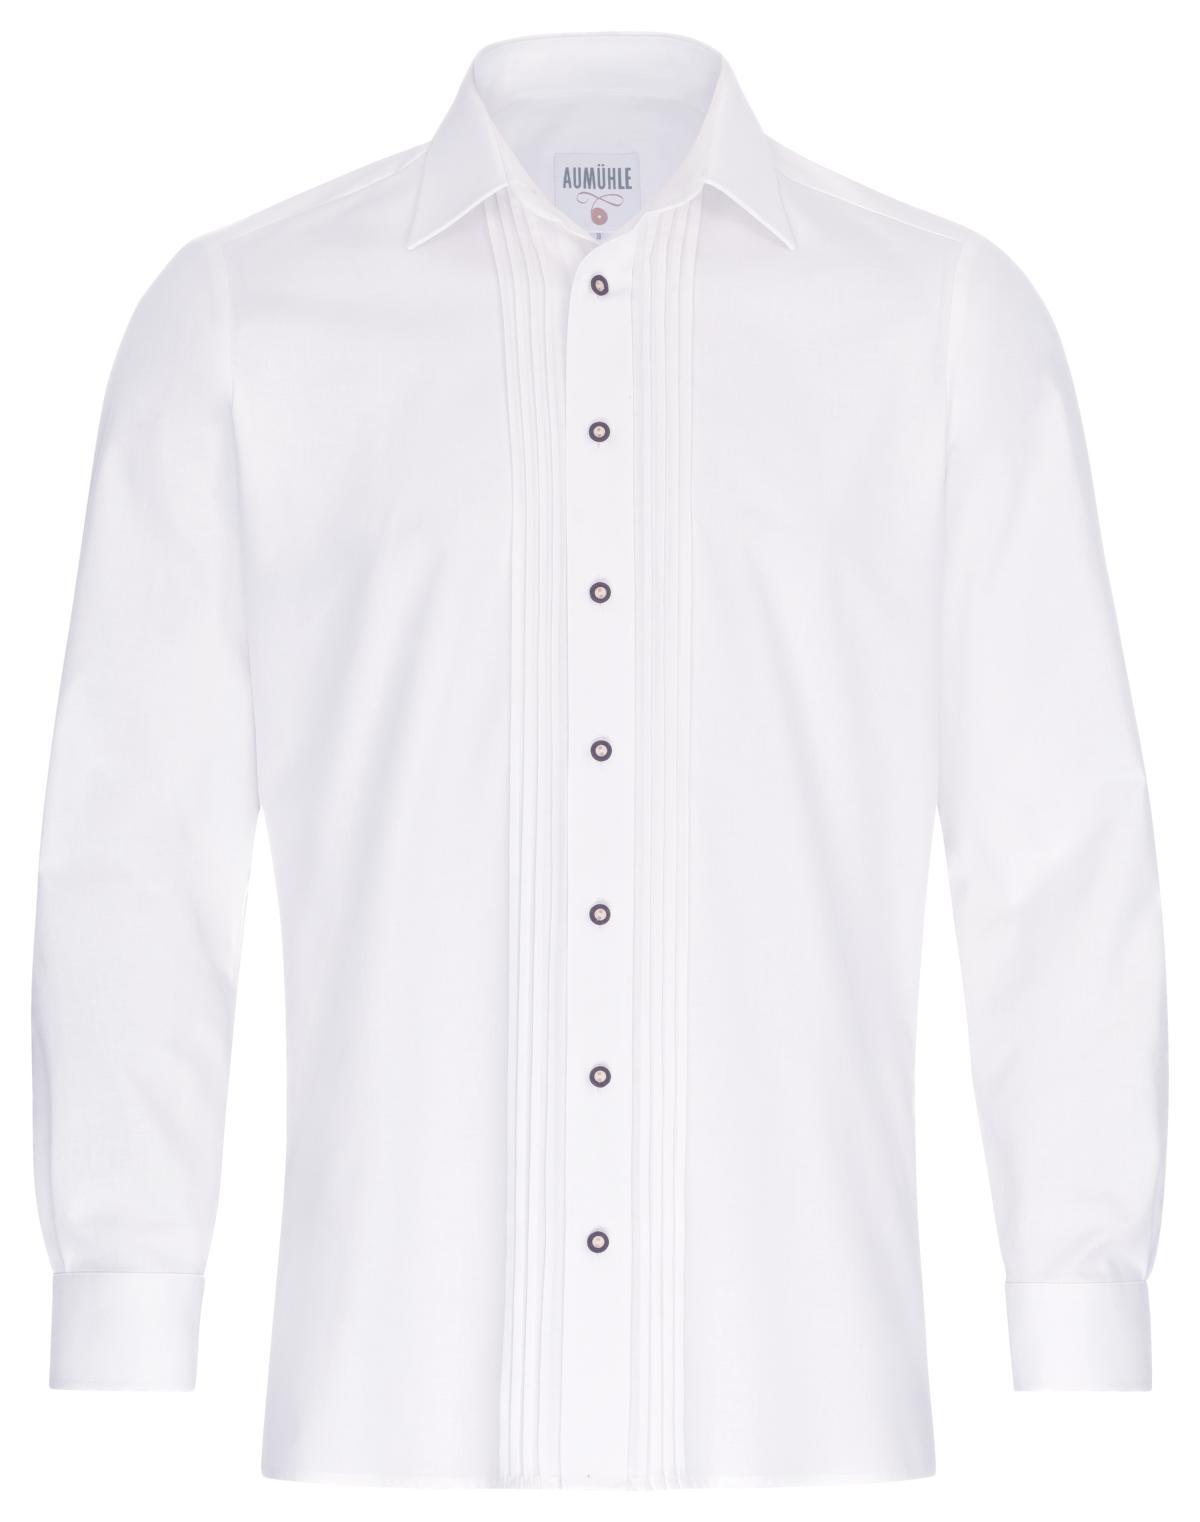 Trachtenhemd - Aying